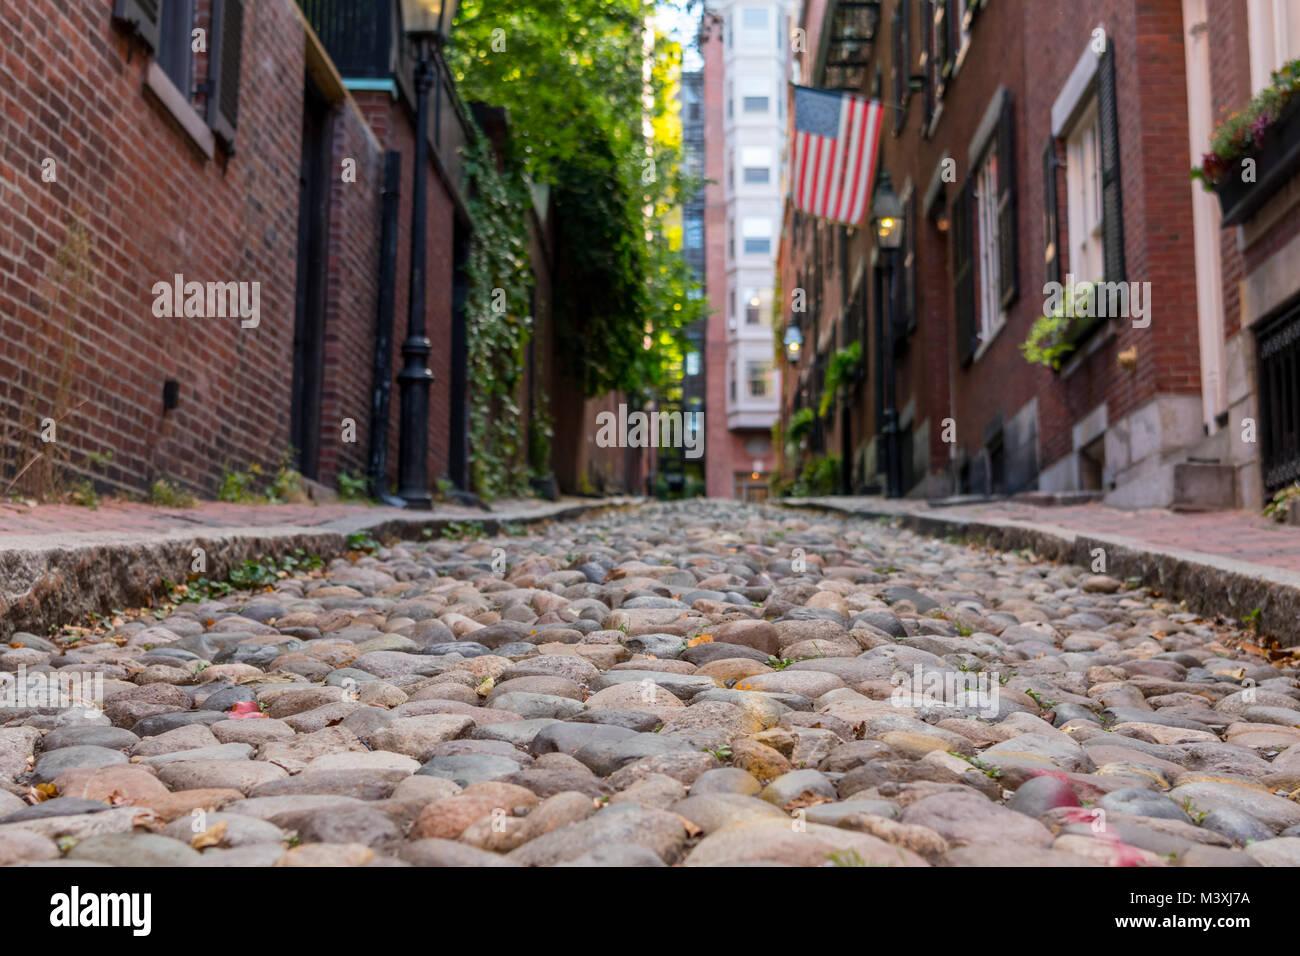 Looking Down Acorn Street in historic Boston - Stock Image